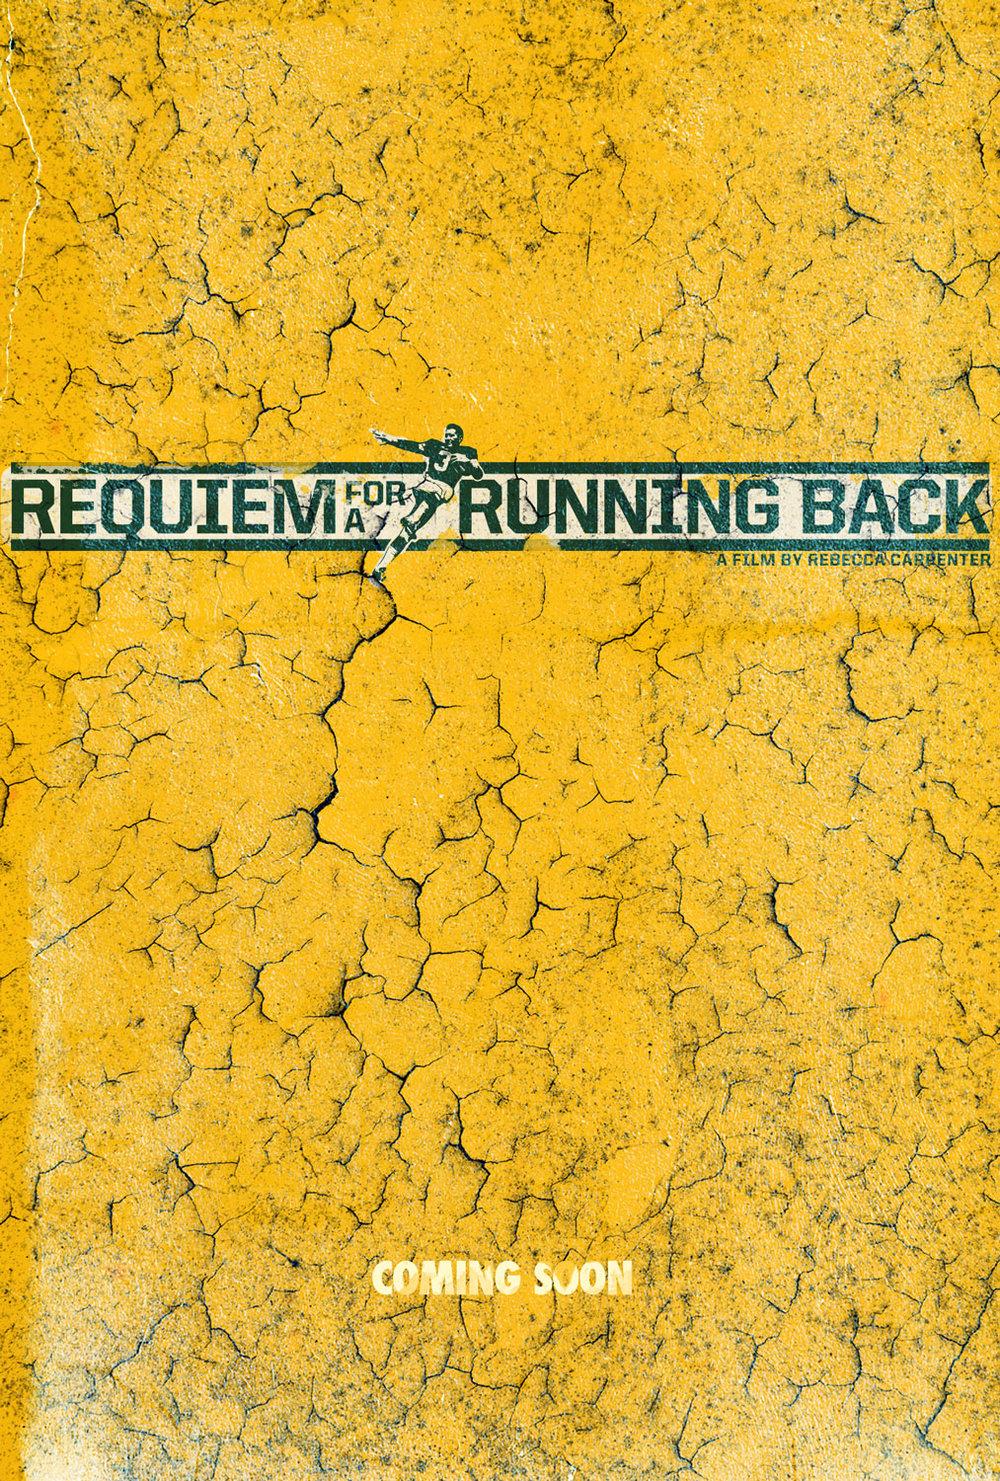 RequiemForARunningBack-Film-Teaser-Poster.jpg